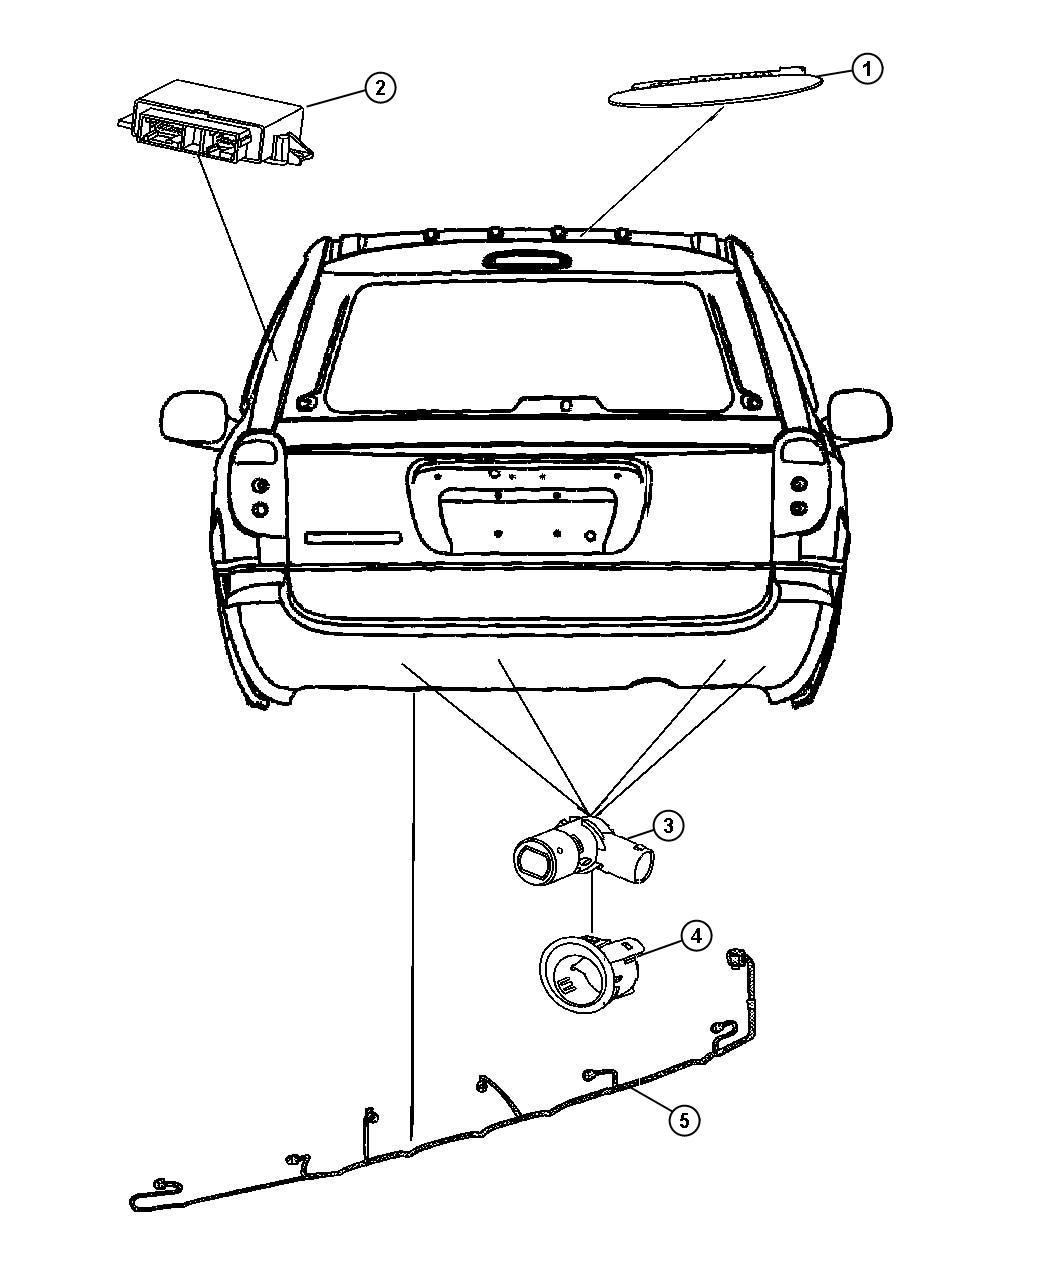 chrysler town  u0026 country wiring  rear fascia  park assist sensor jumper  bench  seats  system